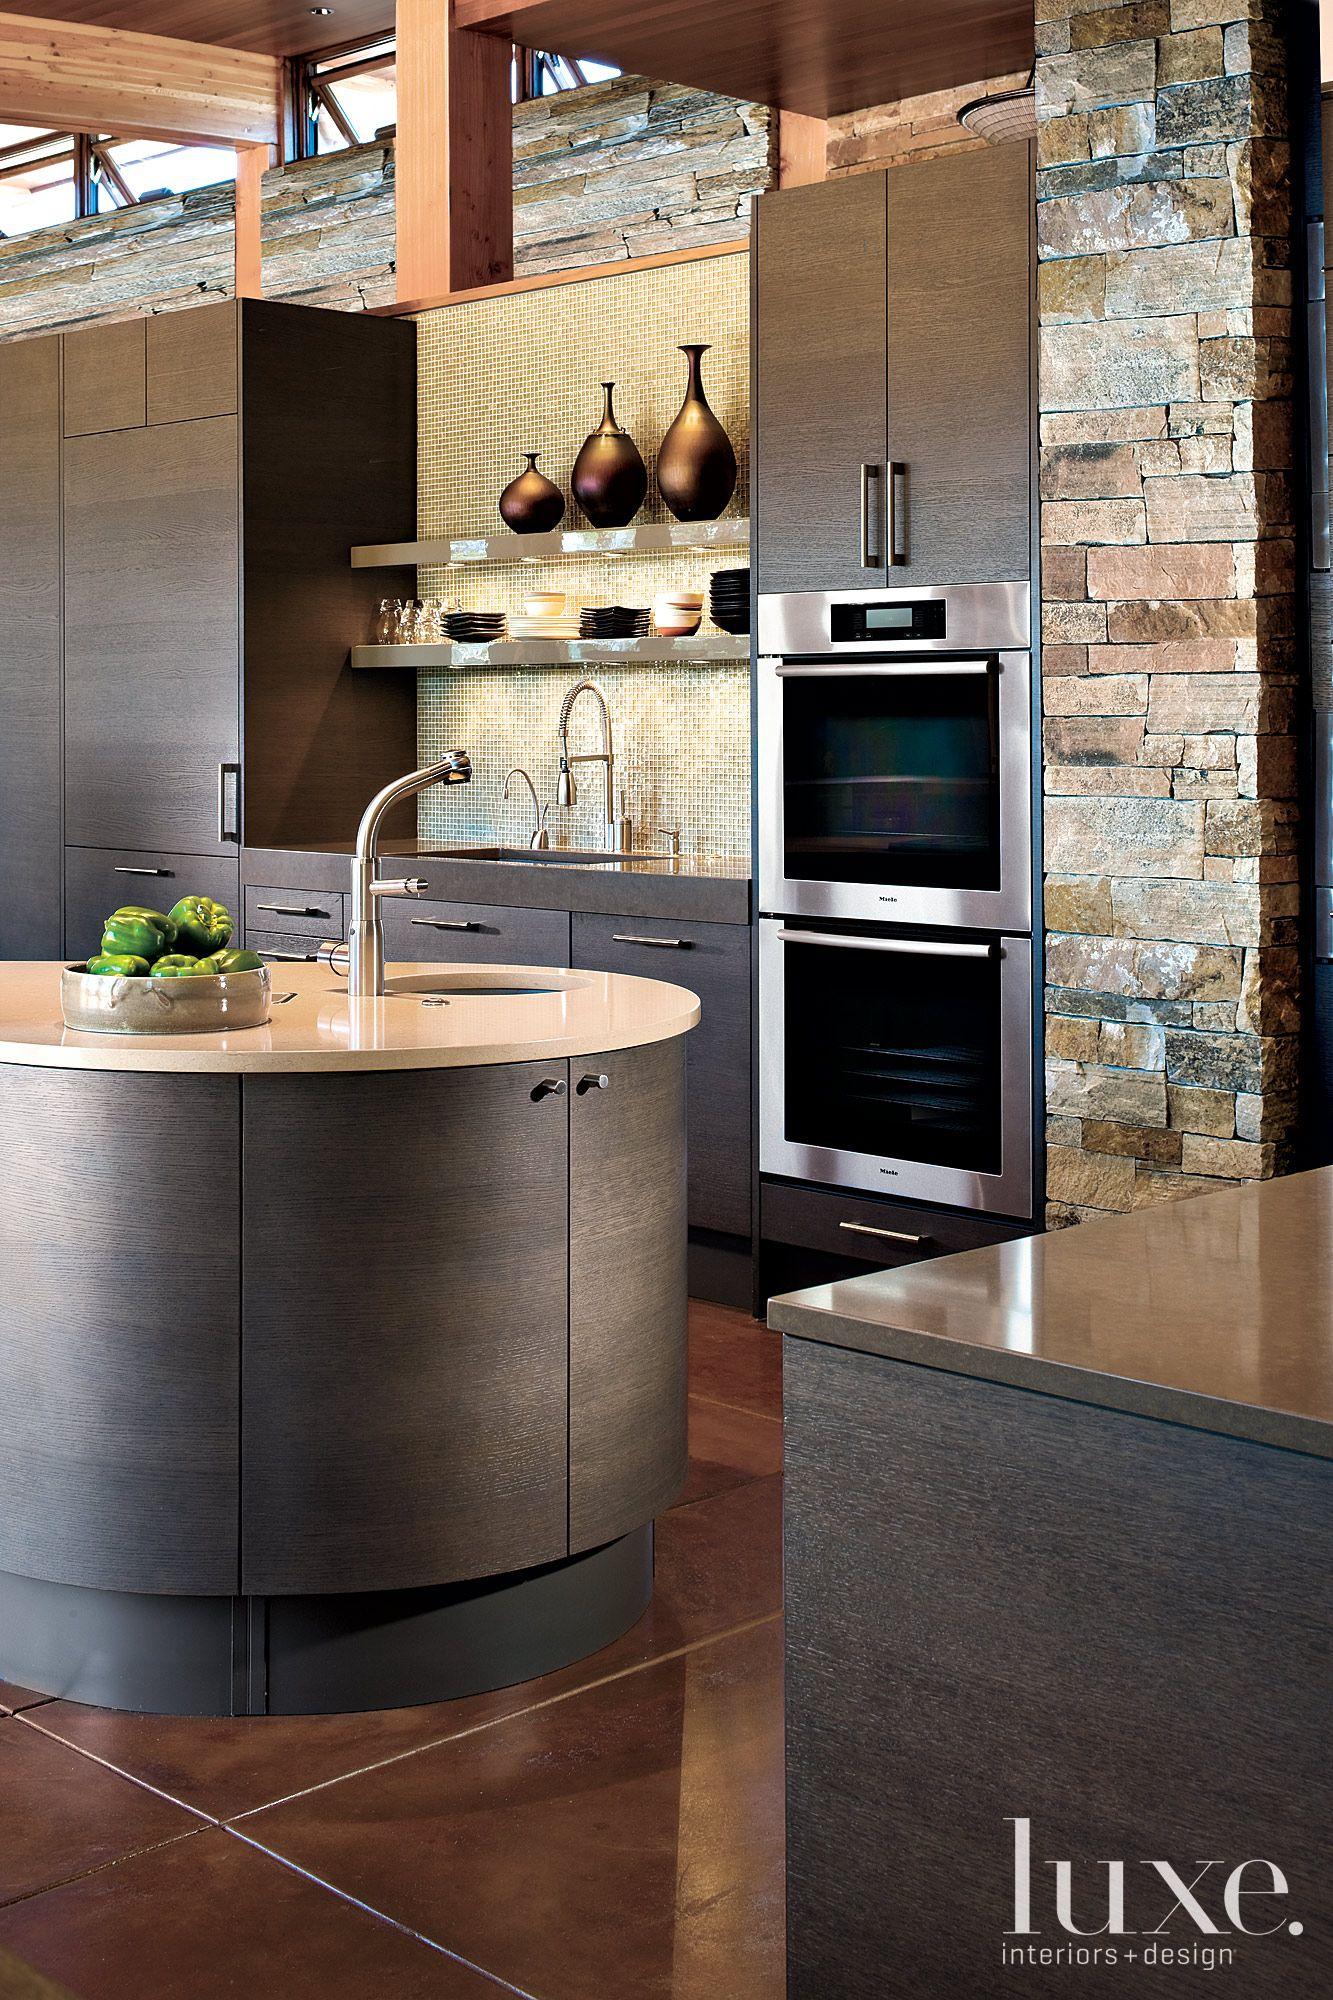 Luxe Interiors Design Magazine The Destination Where Design Connects Rustic Modern Kitchen Kitchen Design Modern Kitchen